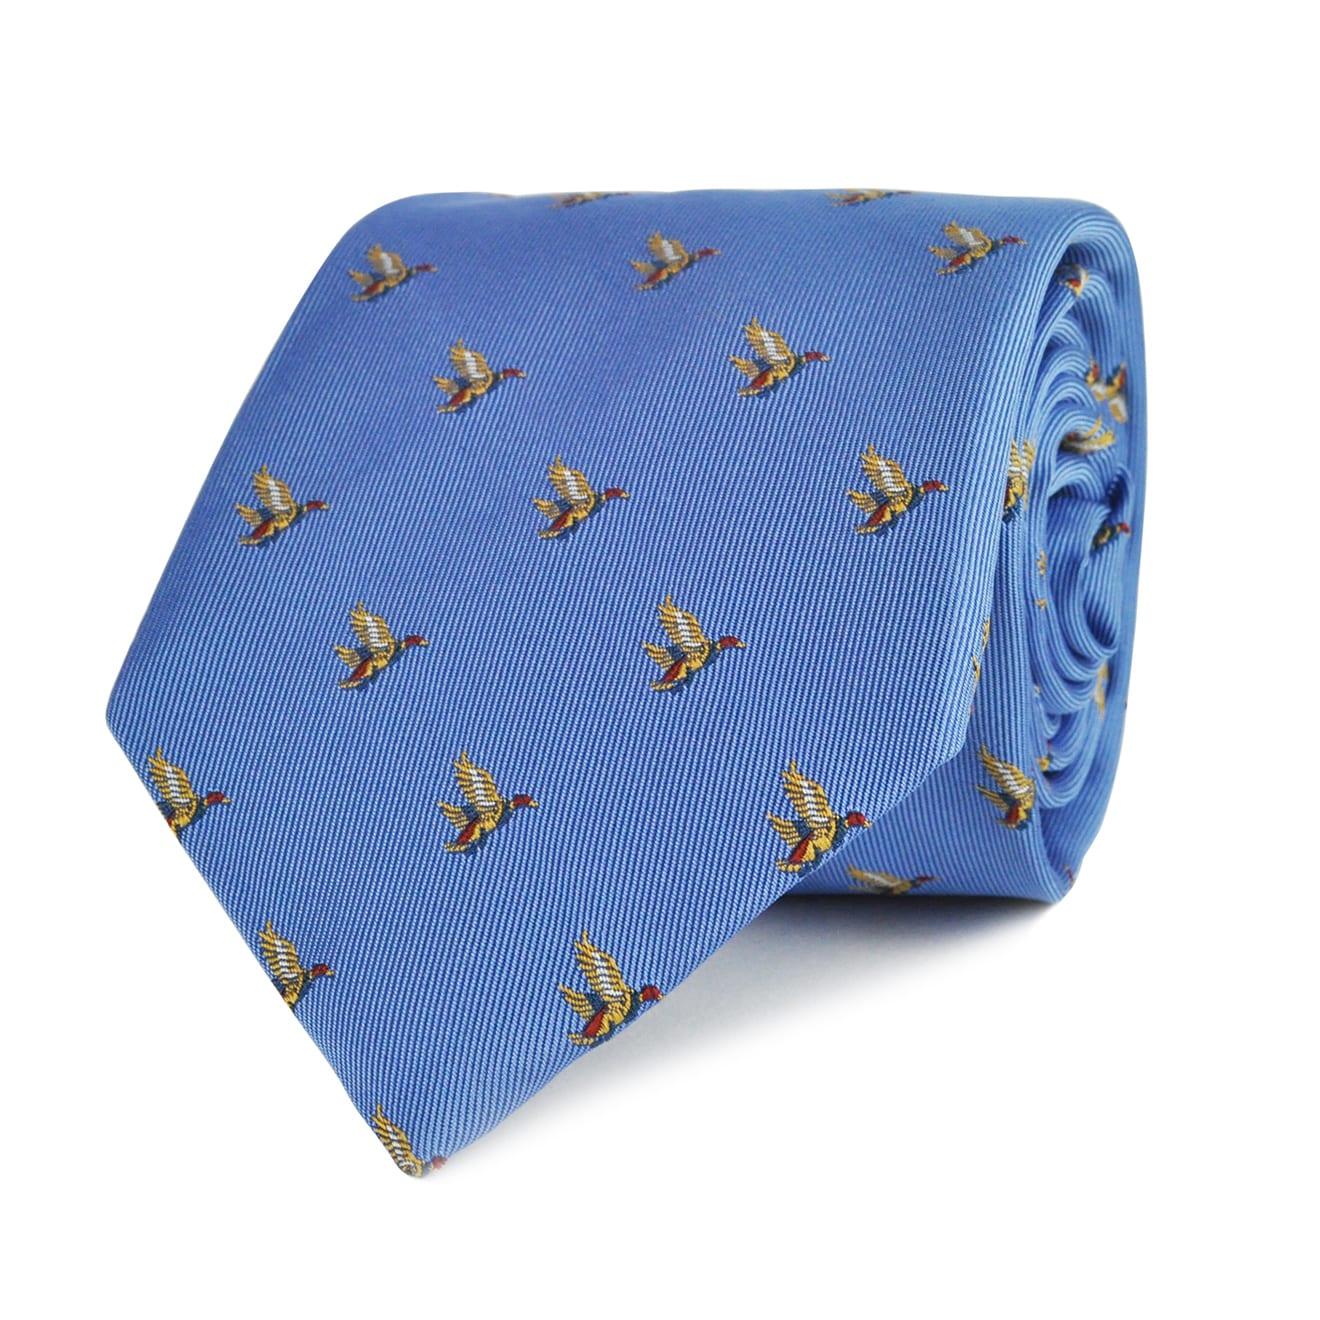 James Purdey Flying Ducks Tie Sky Blue